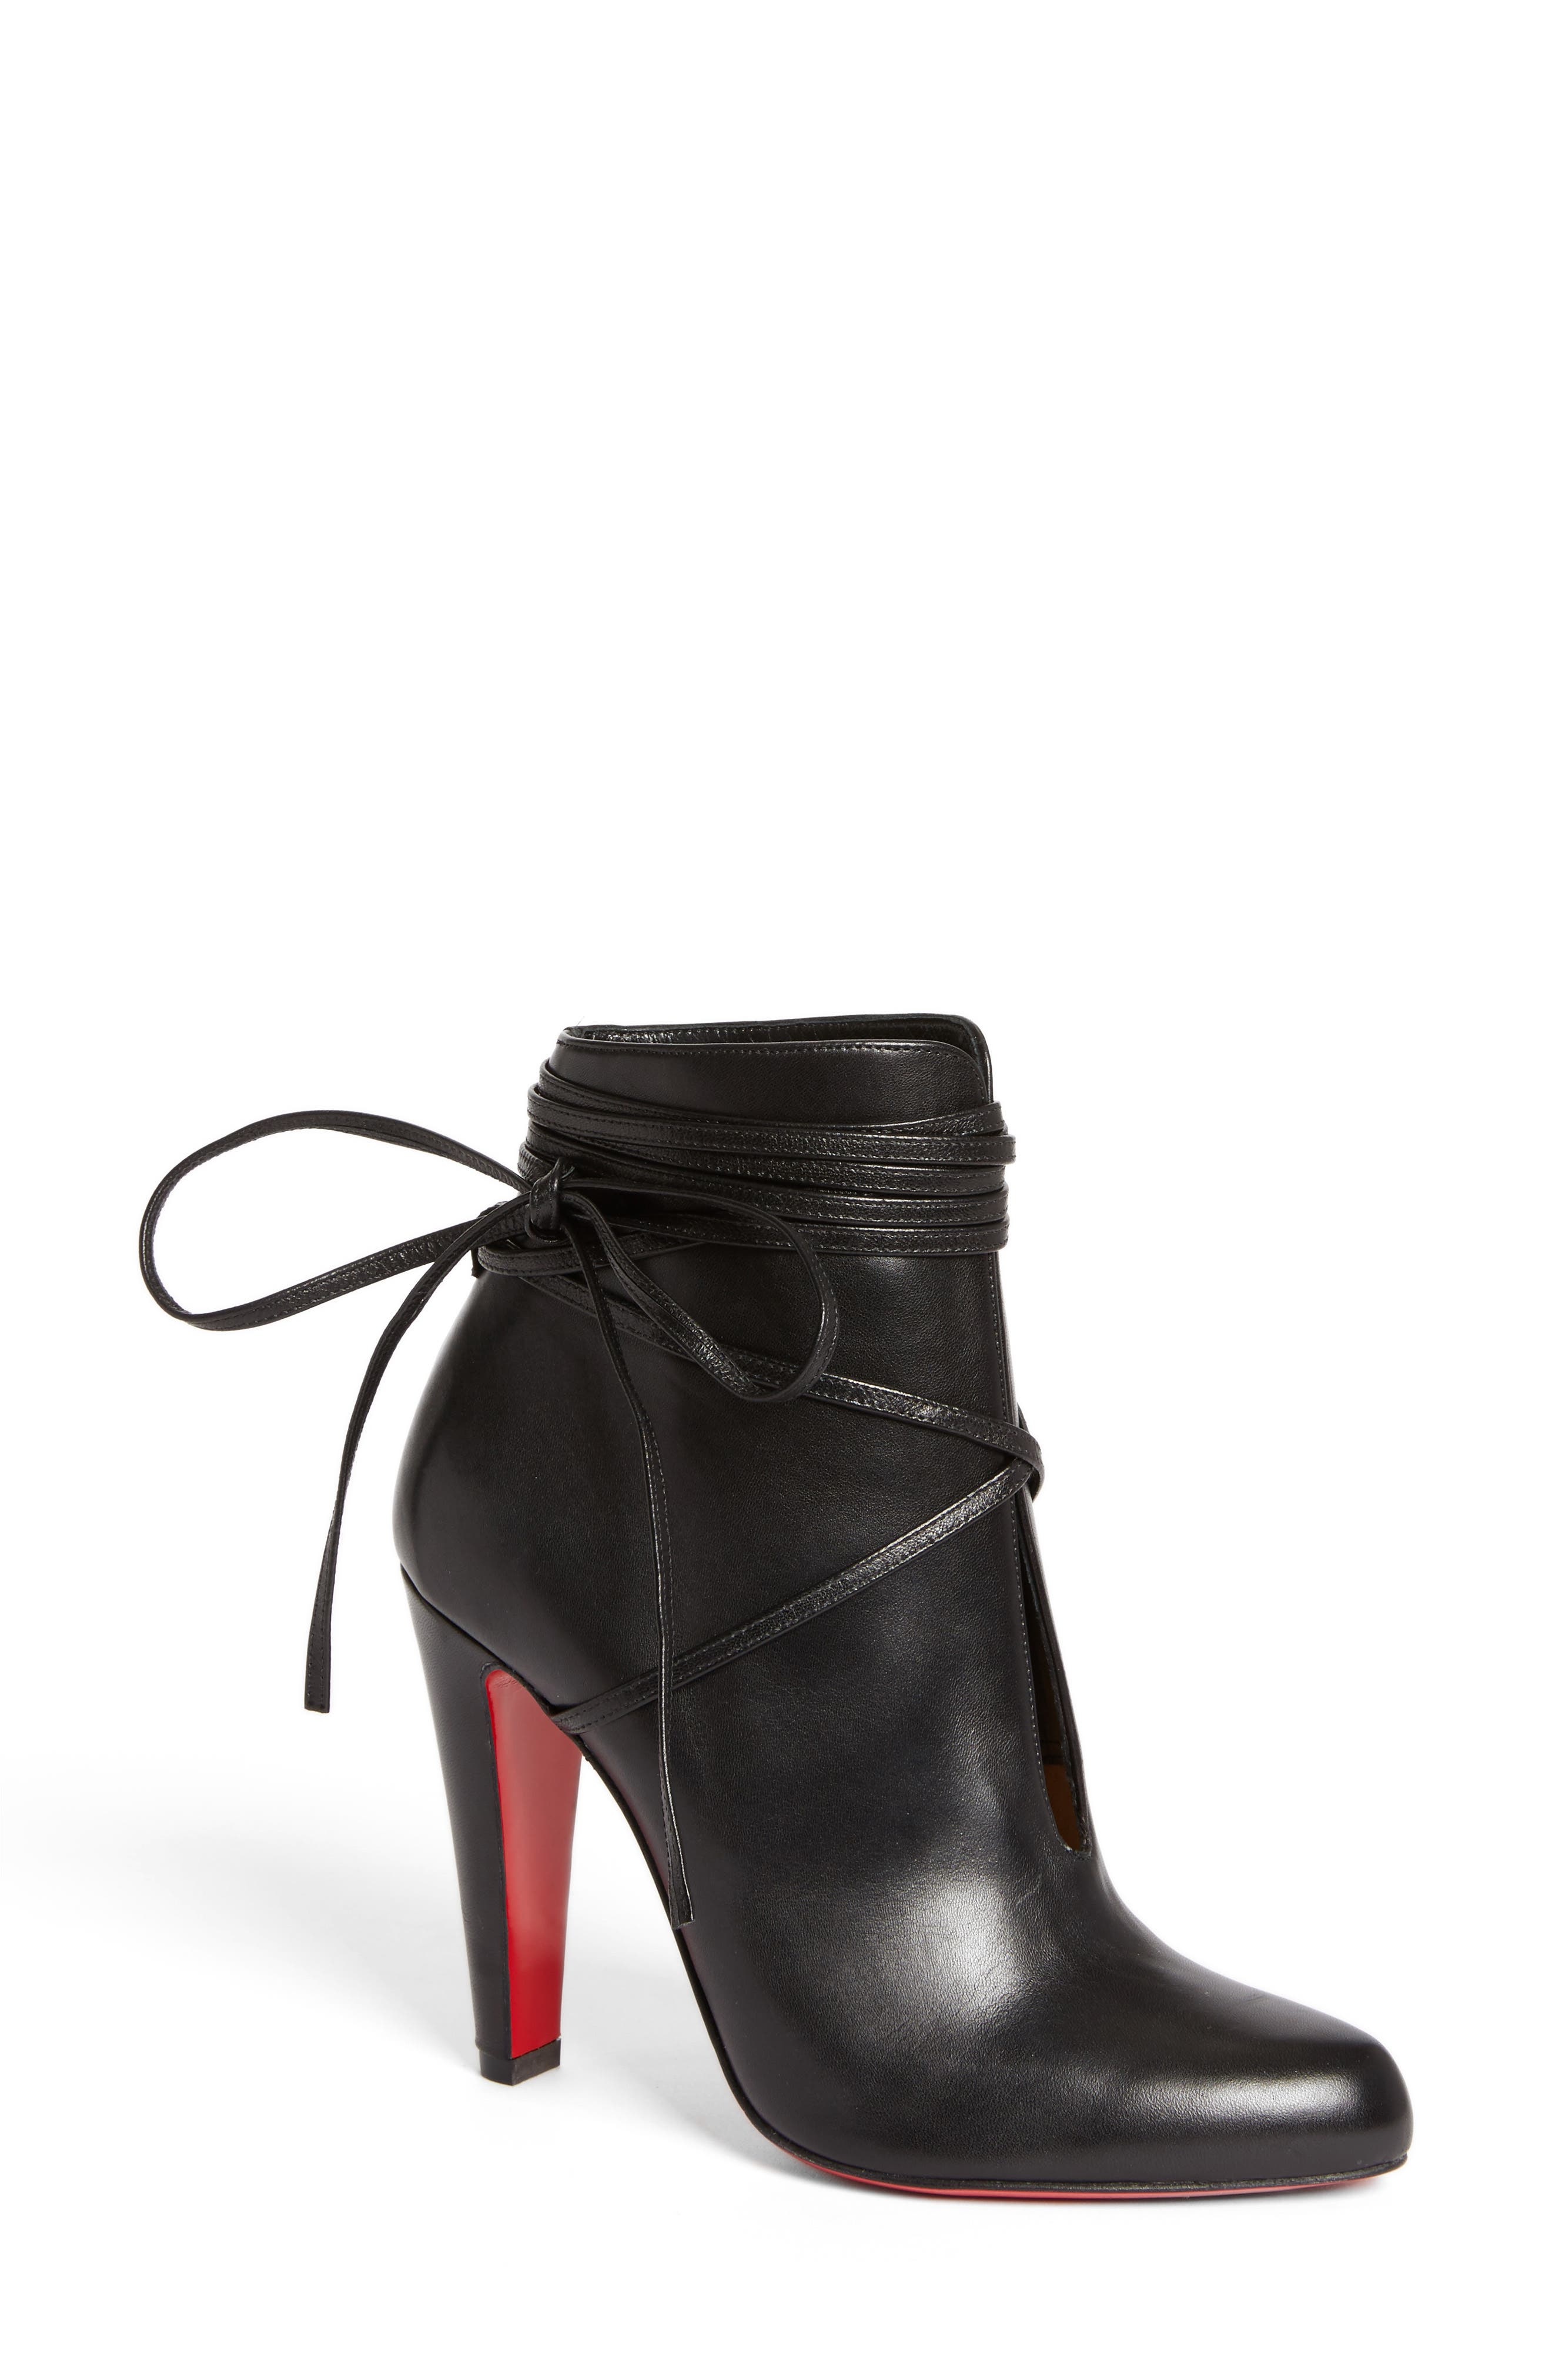 Ankle Tie Bootie,                         Main,                         color, Black Leather